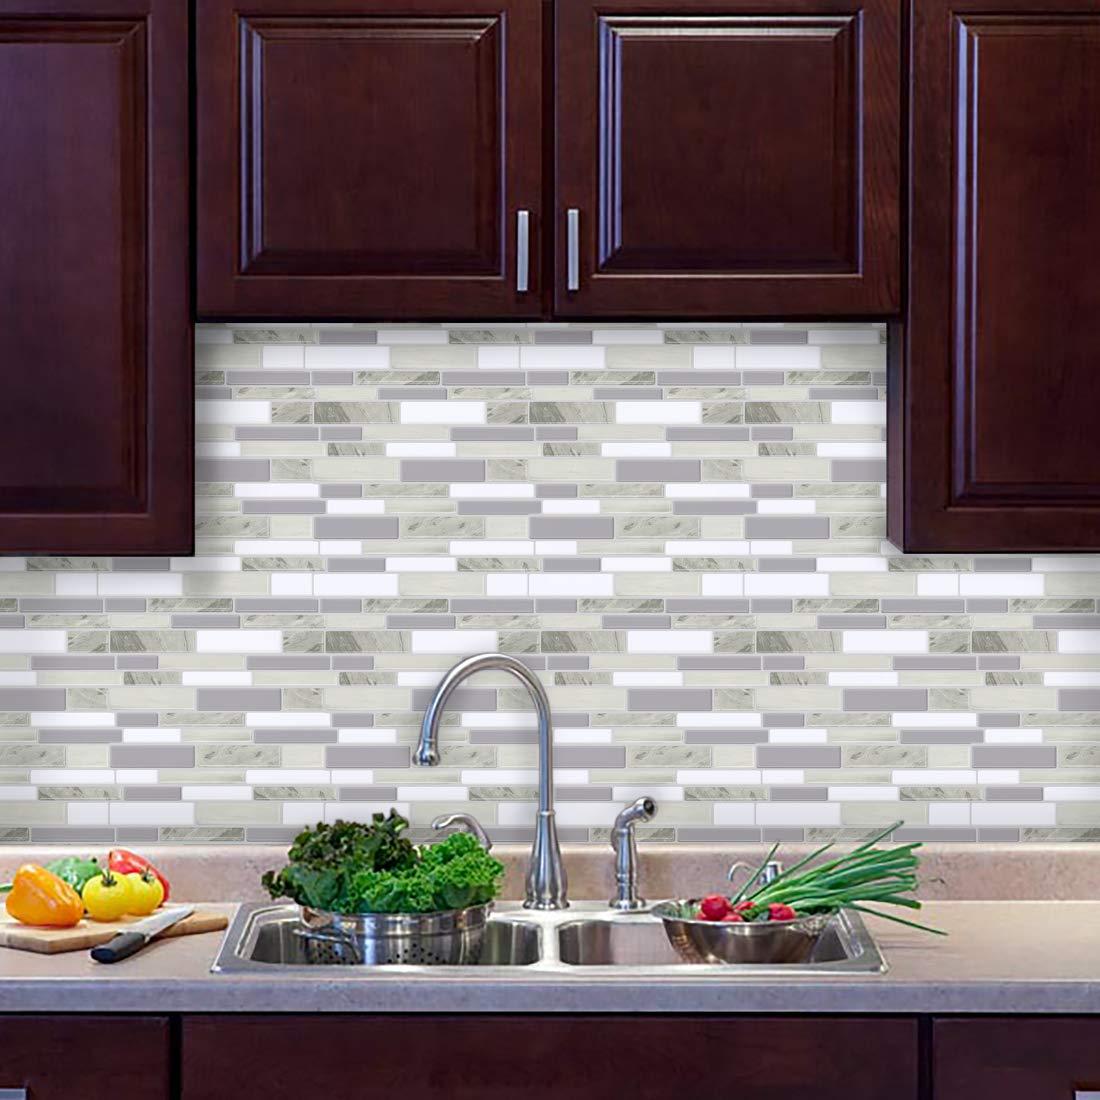 Fam Sticktiles Self Adhesive Tiles For Kitchen Backsplash Peel And Stick Tiles Backsplash Mosaic Tiles Kitchen Tile Transfers Stickers 10 X 10 5 Tiles Buy Online In Malta At Desertcart